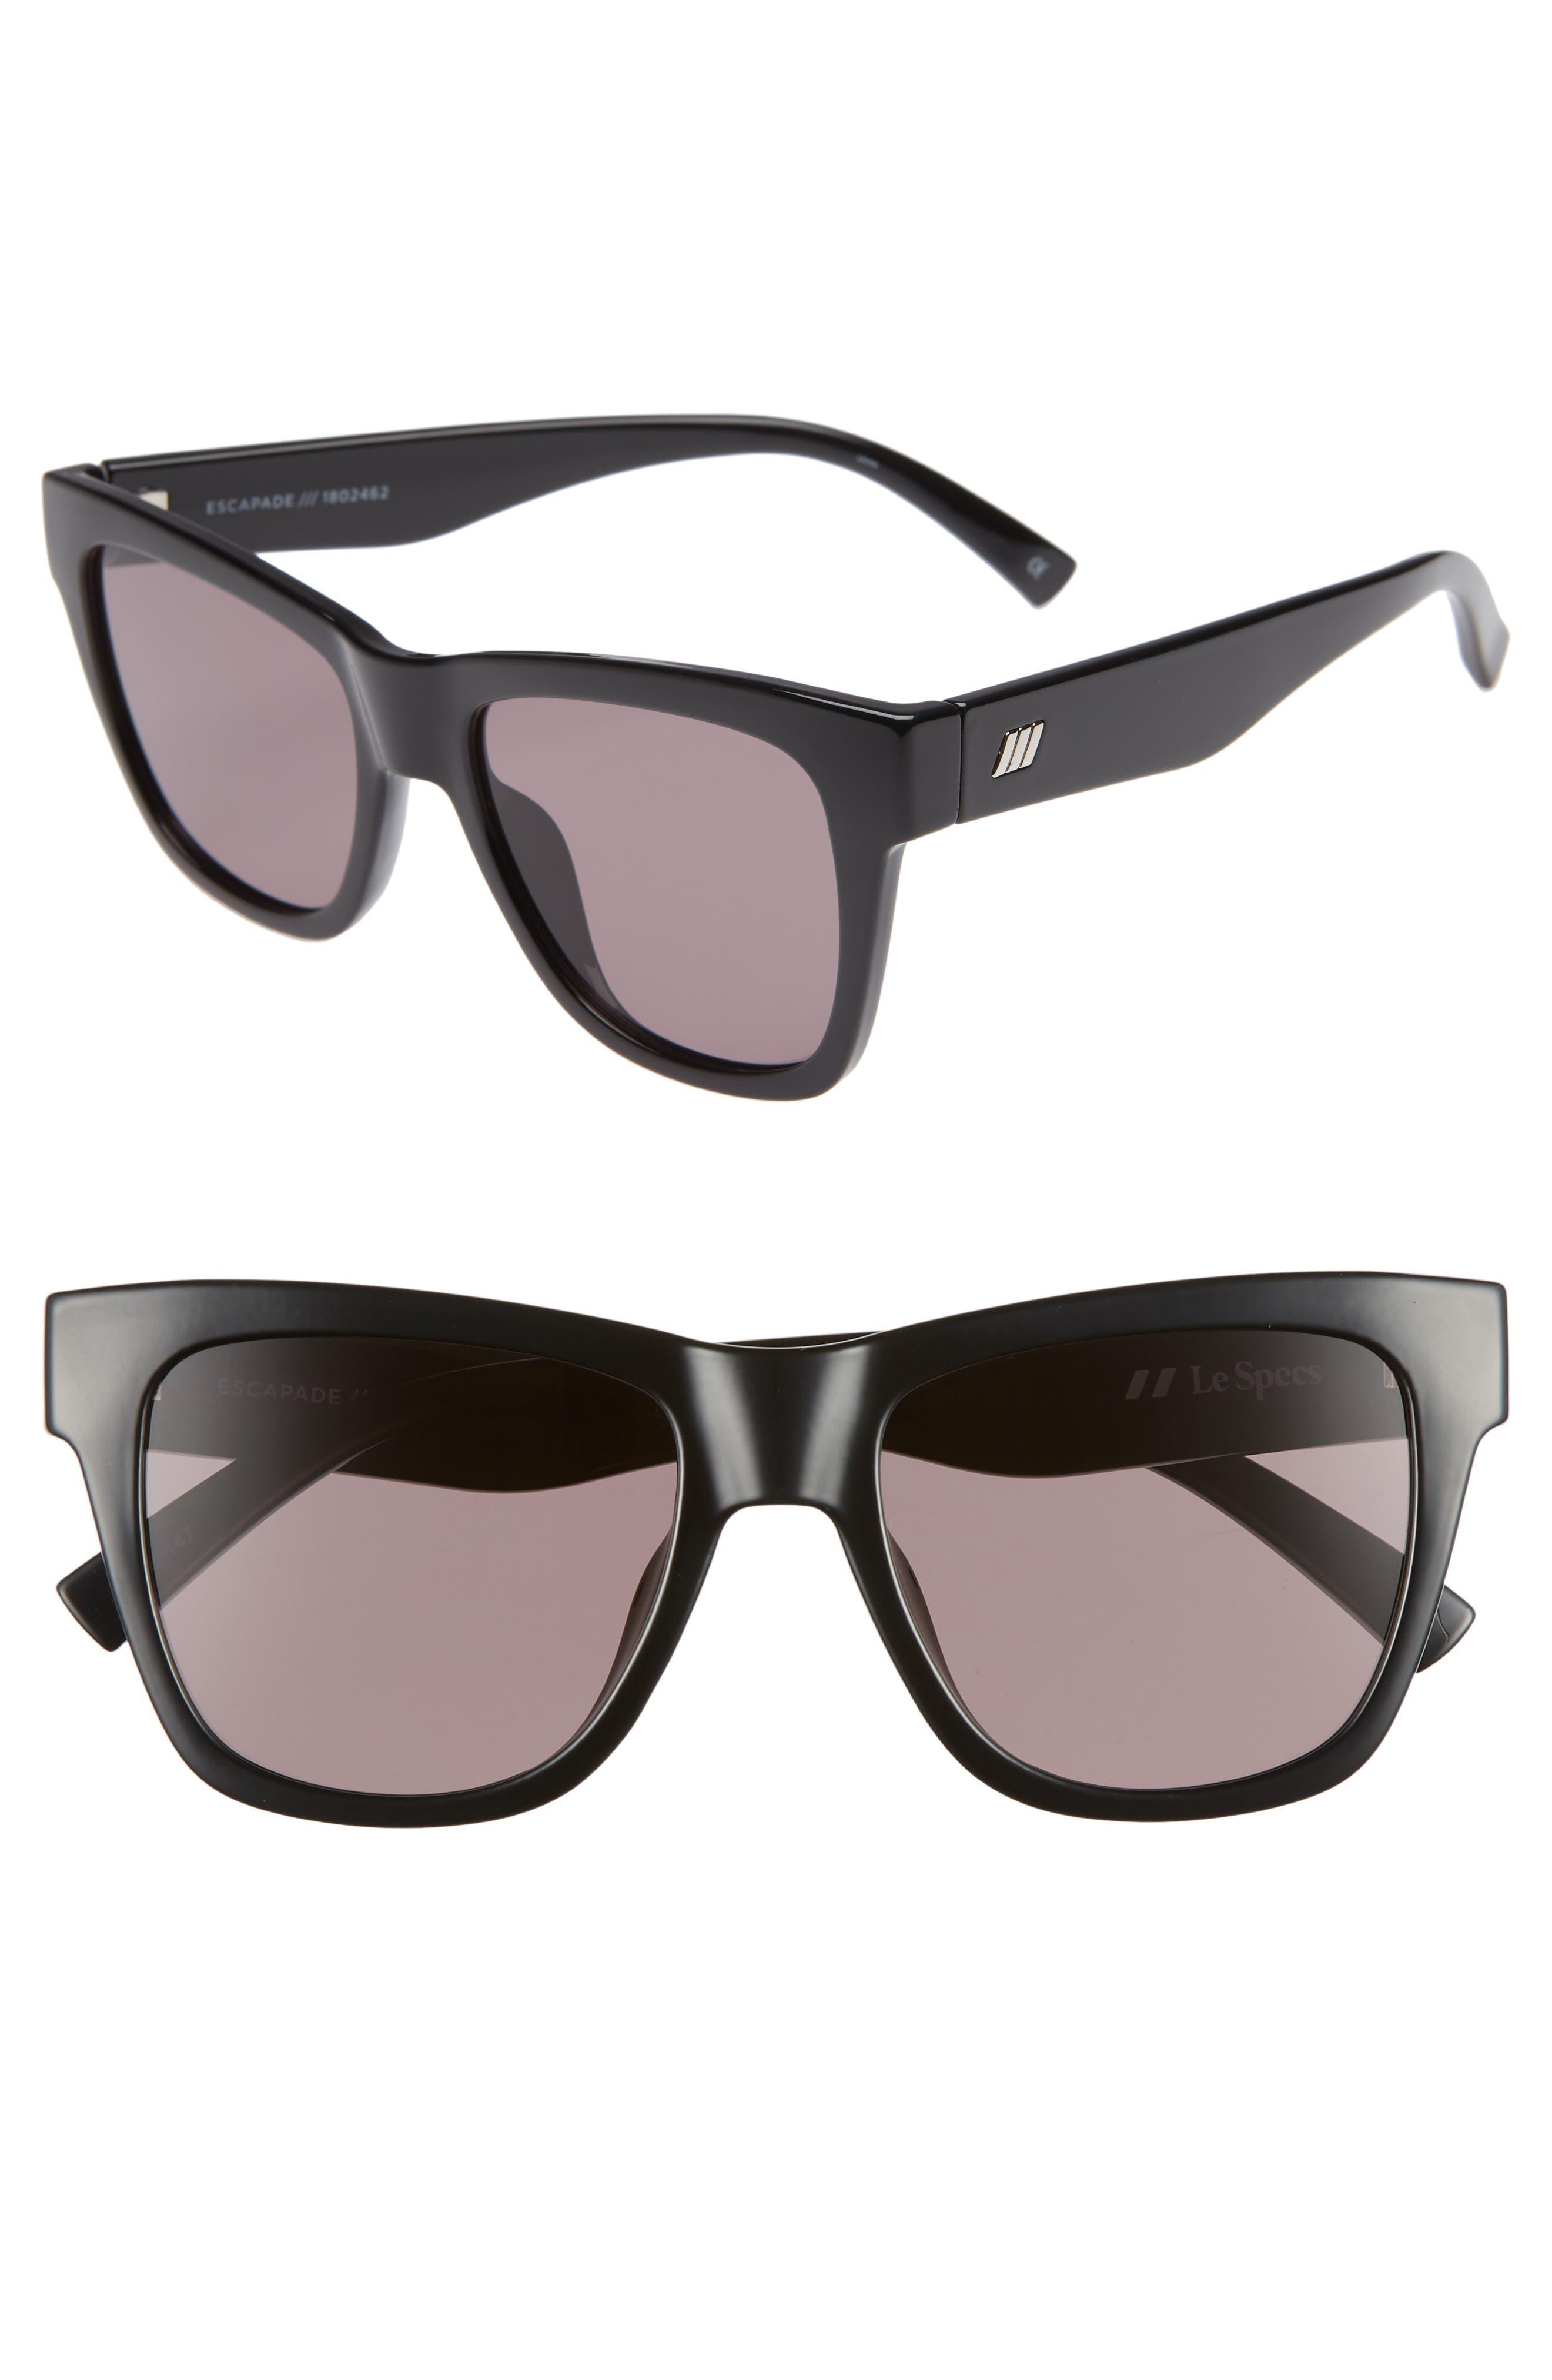 Escapade 54mm Sunglasses,                         Main,                         color, BLACK